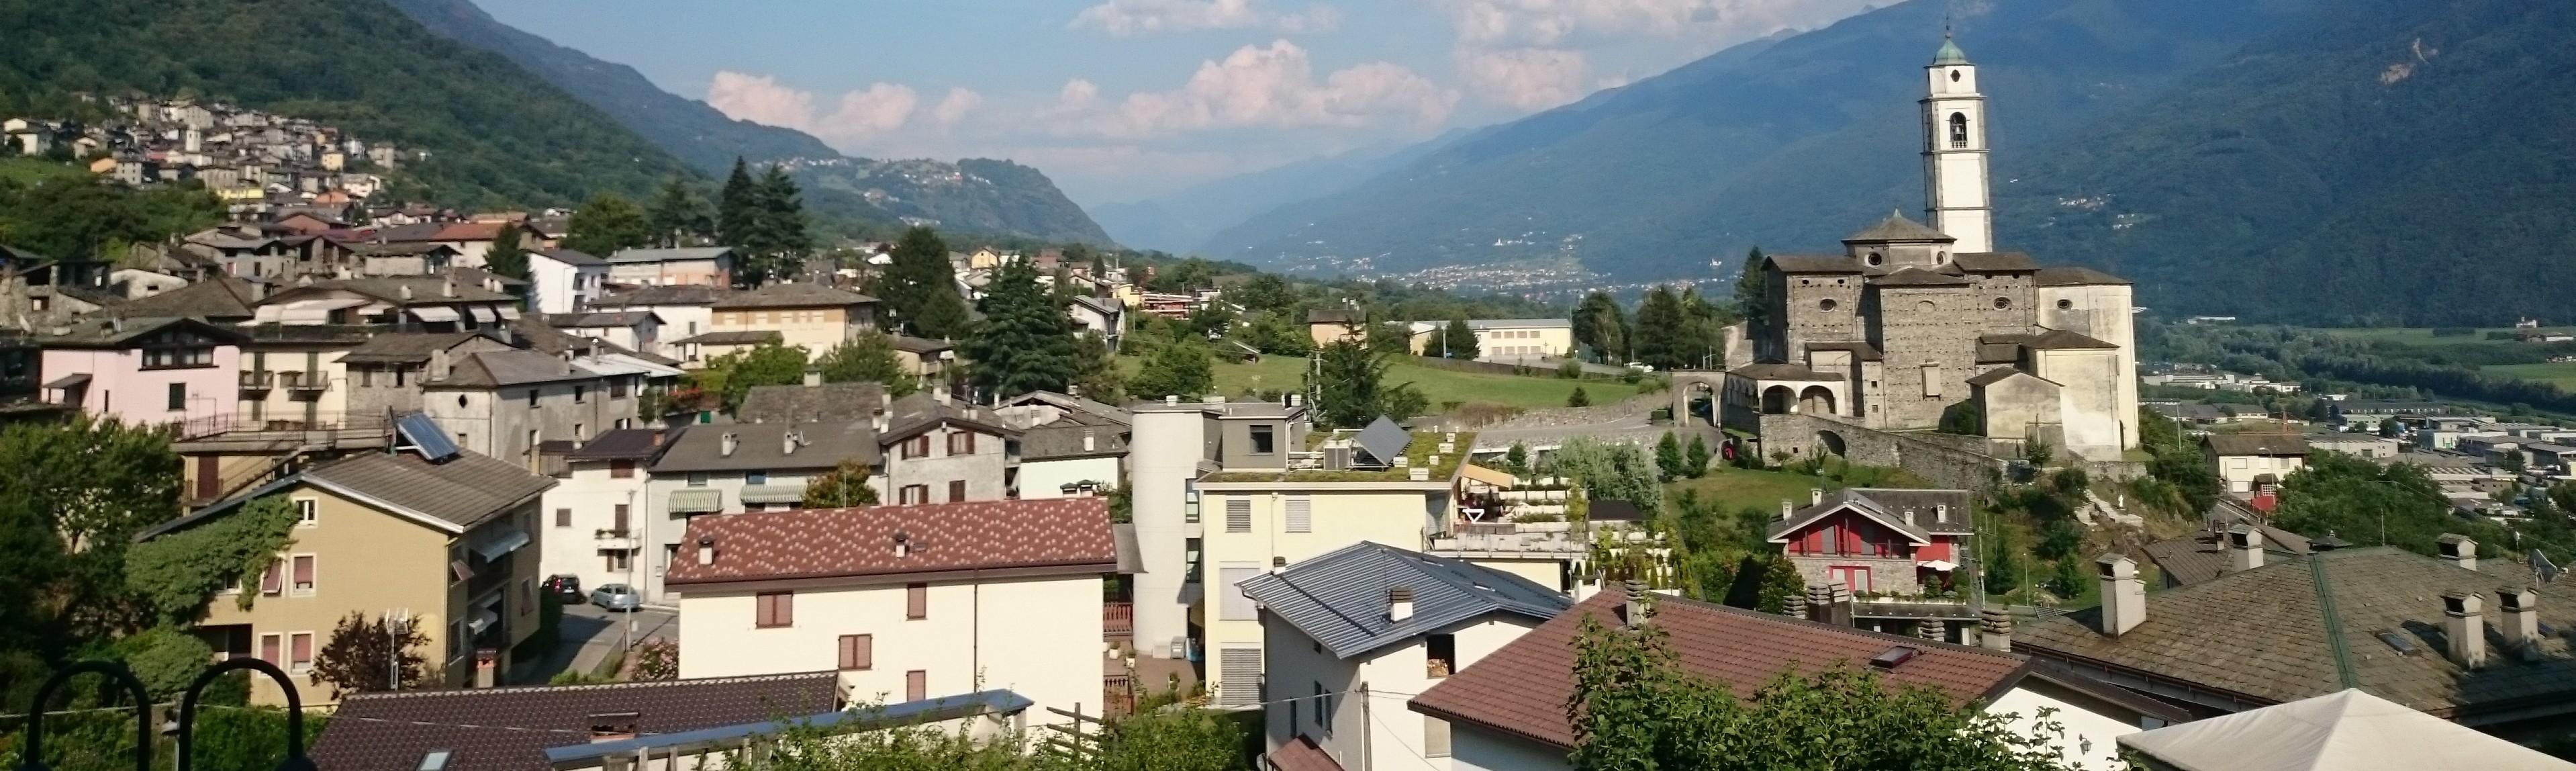 Berbenno_di_Valtellina